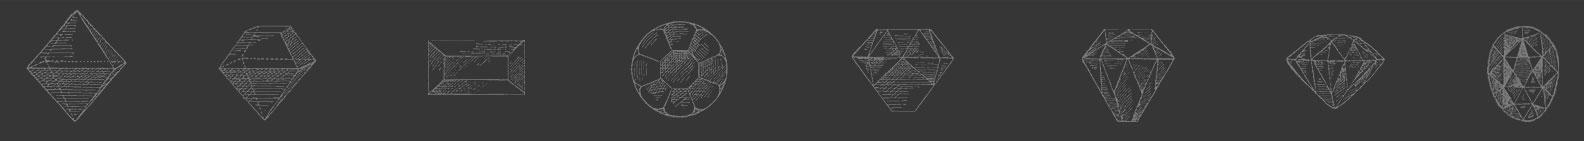 Altschliffdiamanten